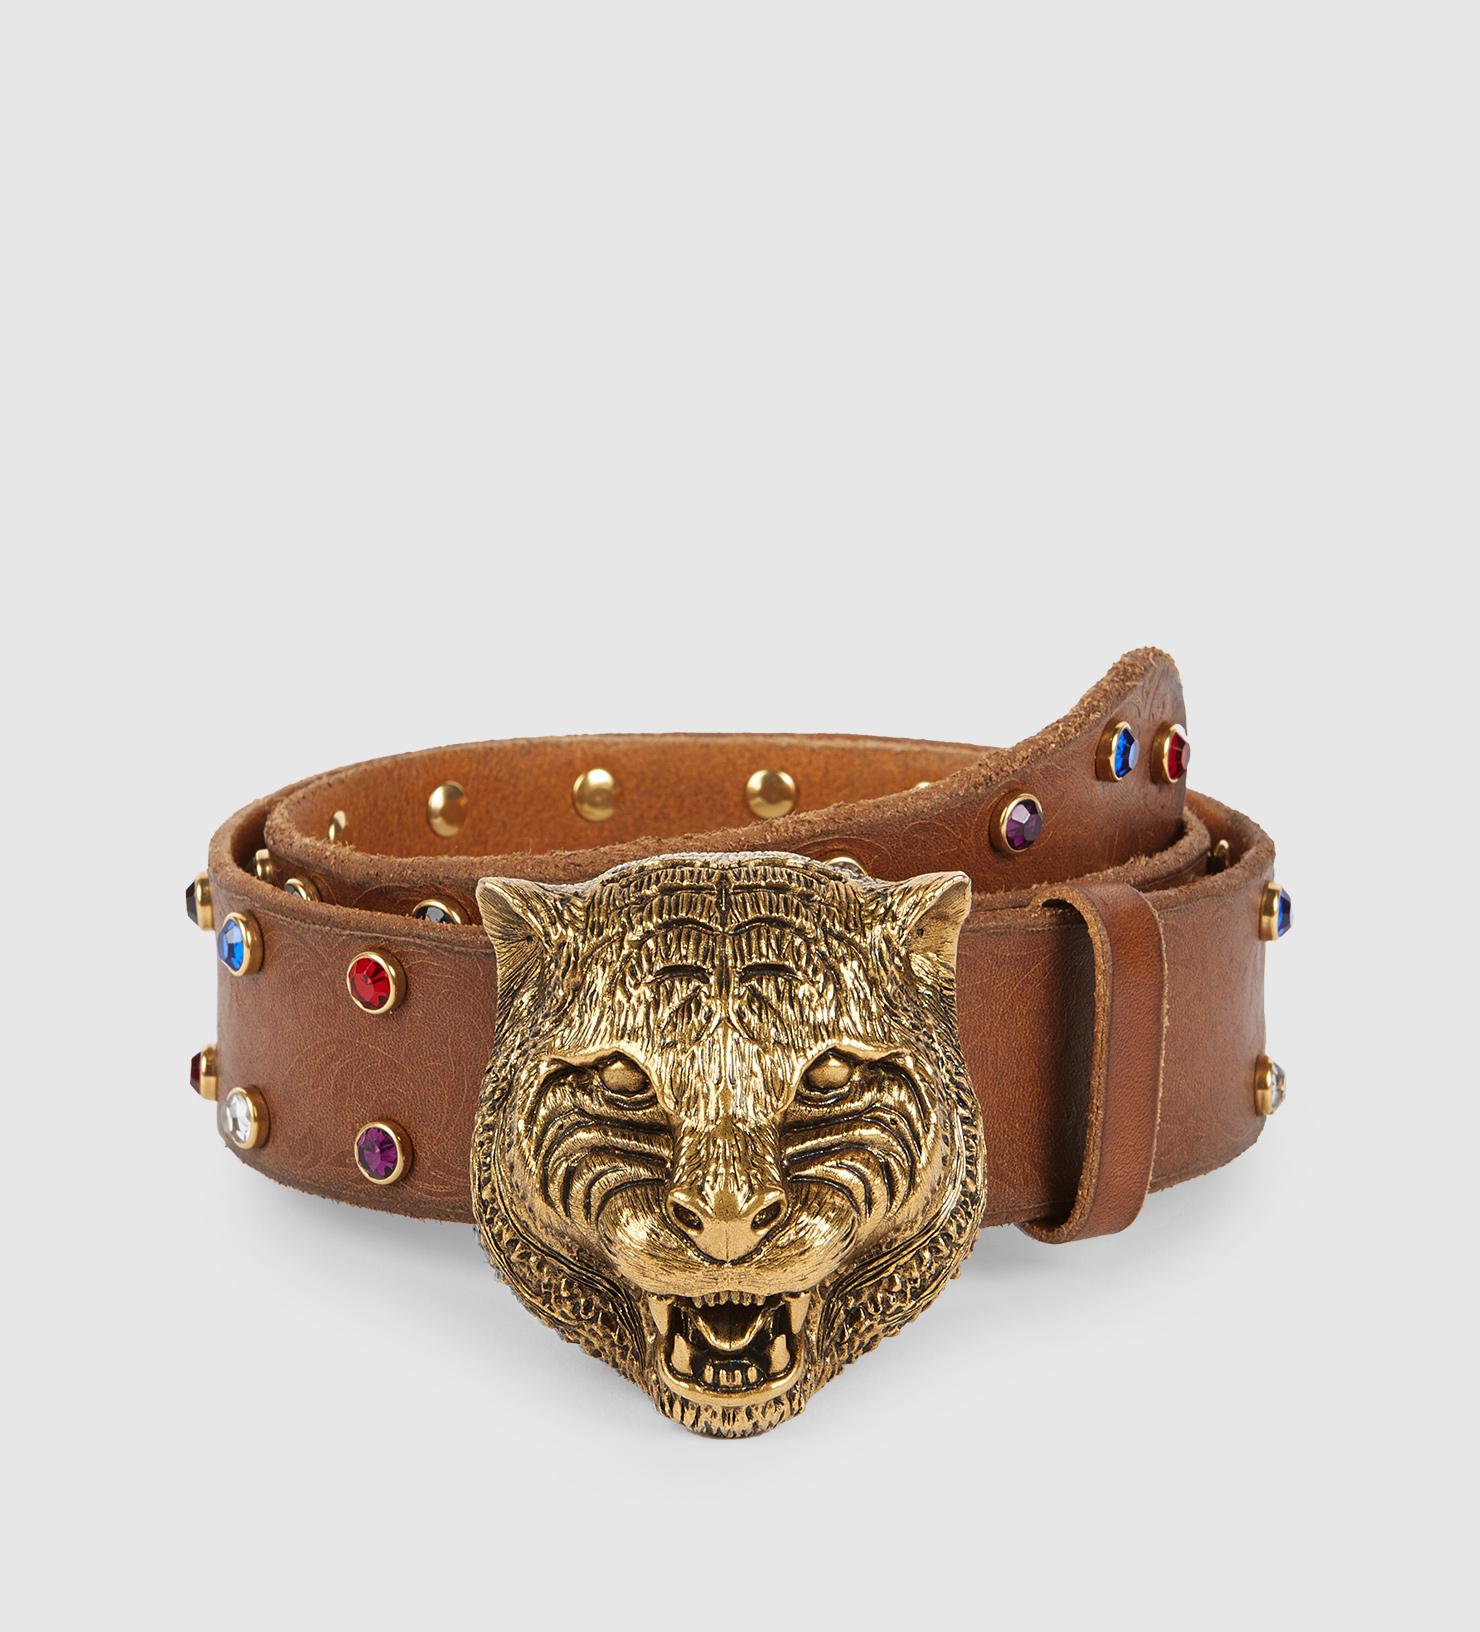 b71d77da826 Lyst - Gucci Studded Belt With Feline Buckle in Metallic